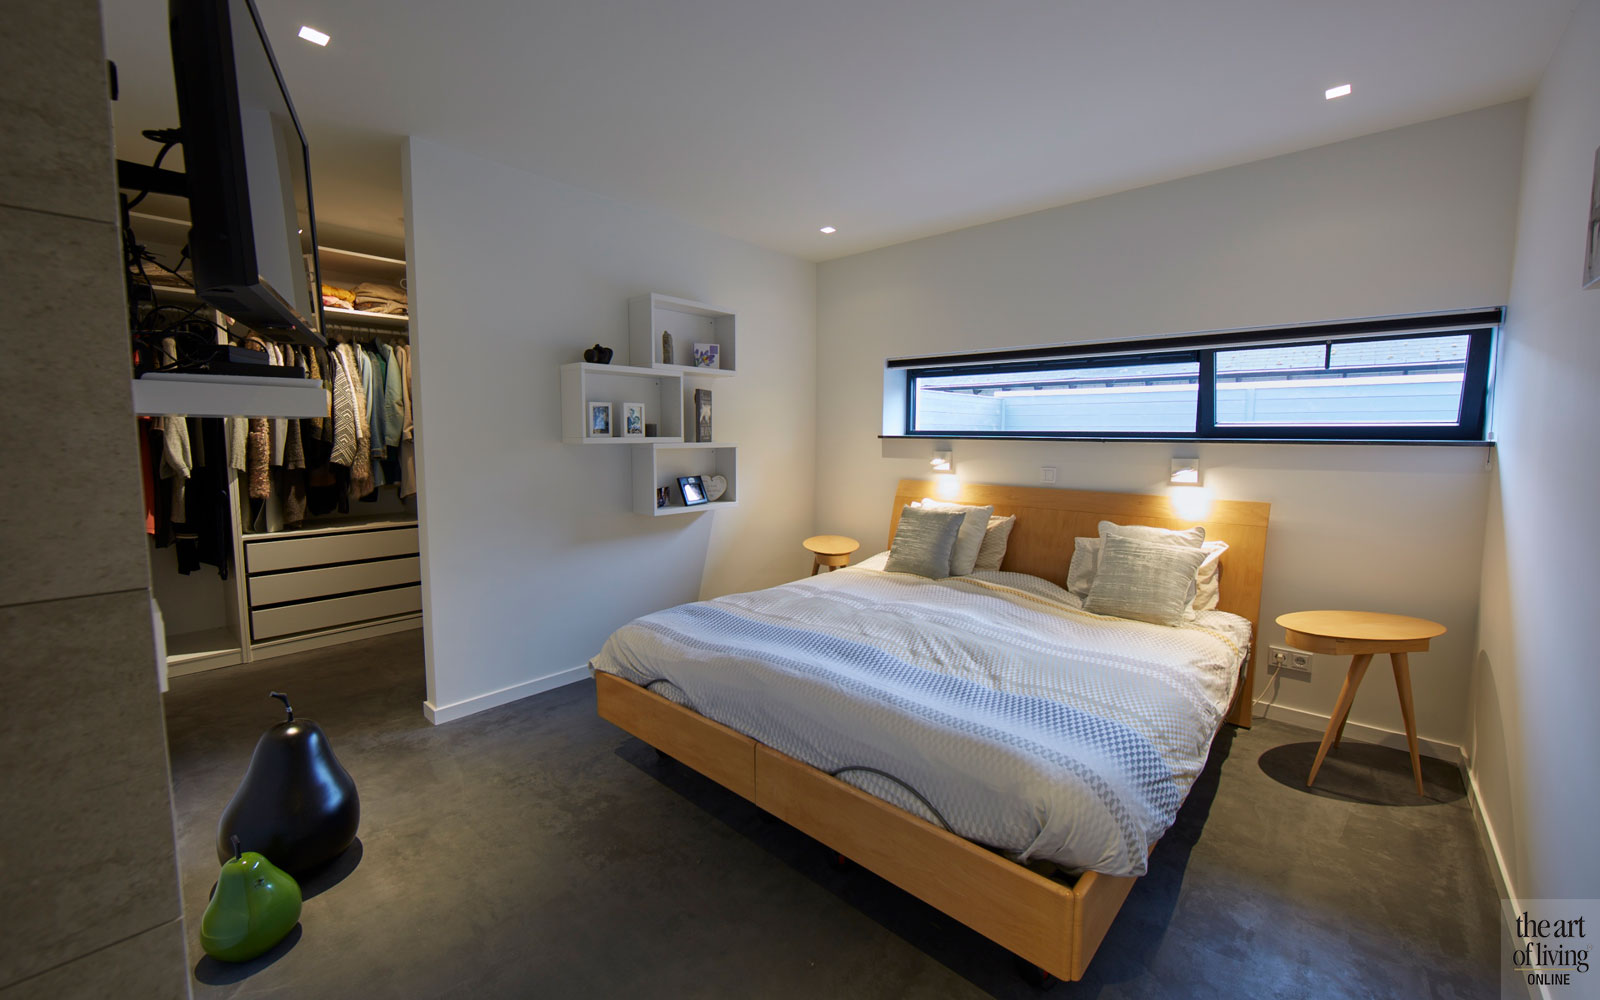 Slaapkamer, master bedroom, boxspring, inloopkast, televisie, moderne bungalow, Leenders Architecten en Ingenieurs